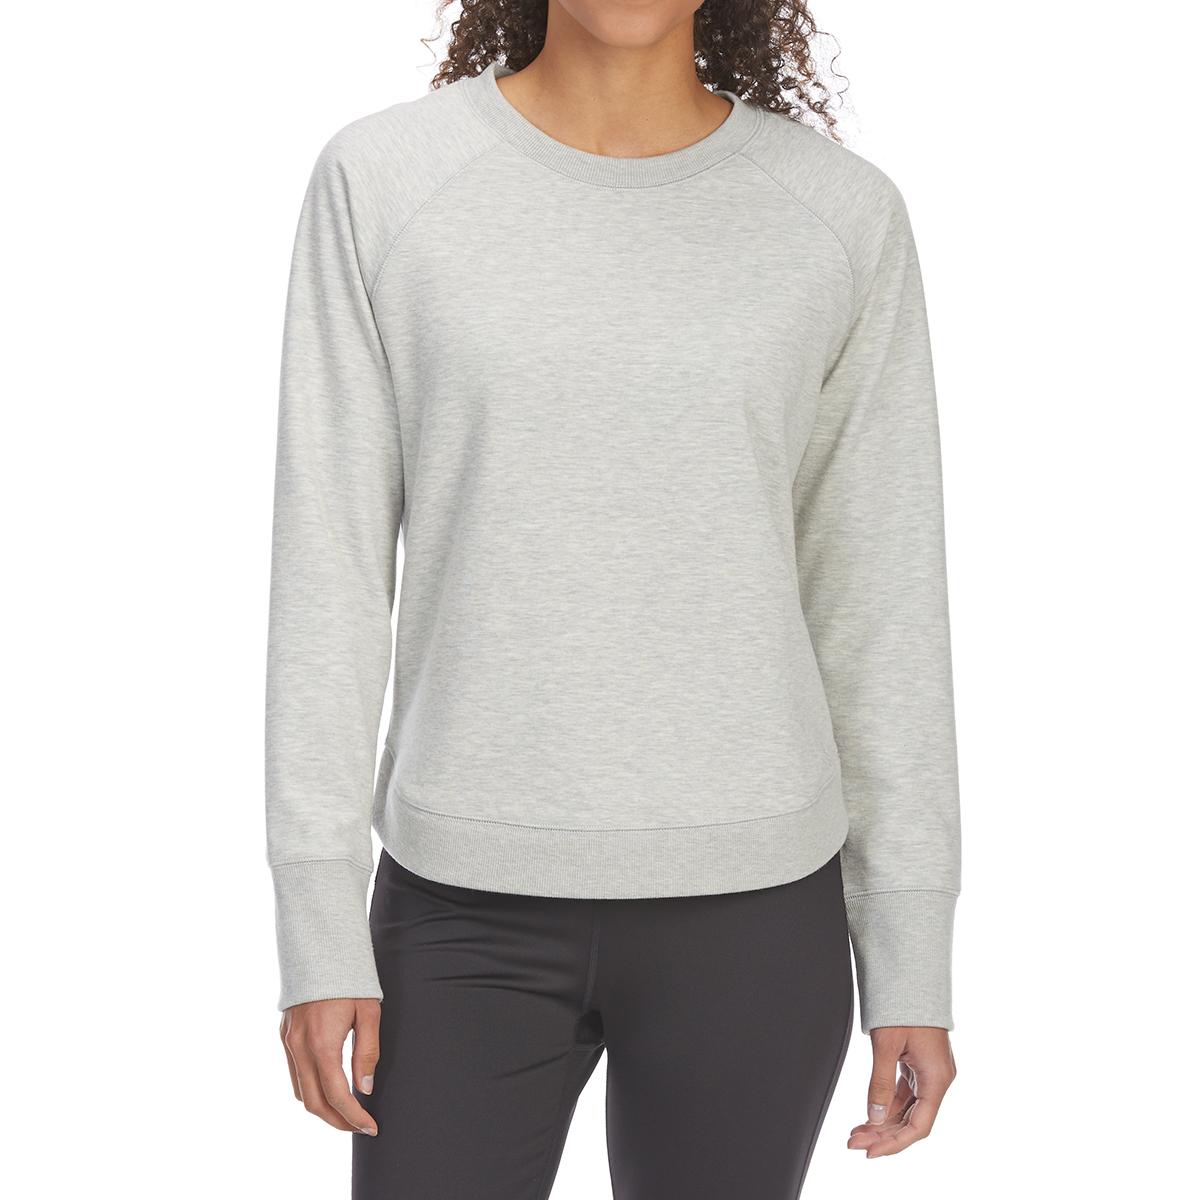 Ems Women's Canyon Knit Pullover - White, XS